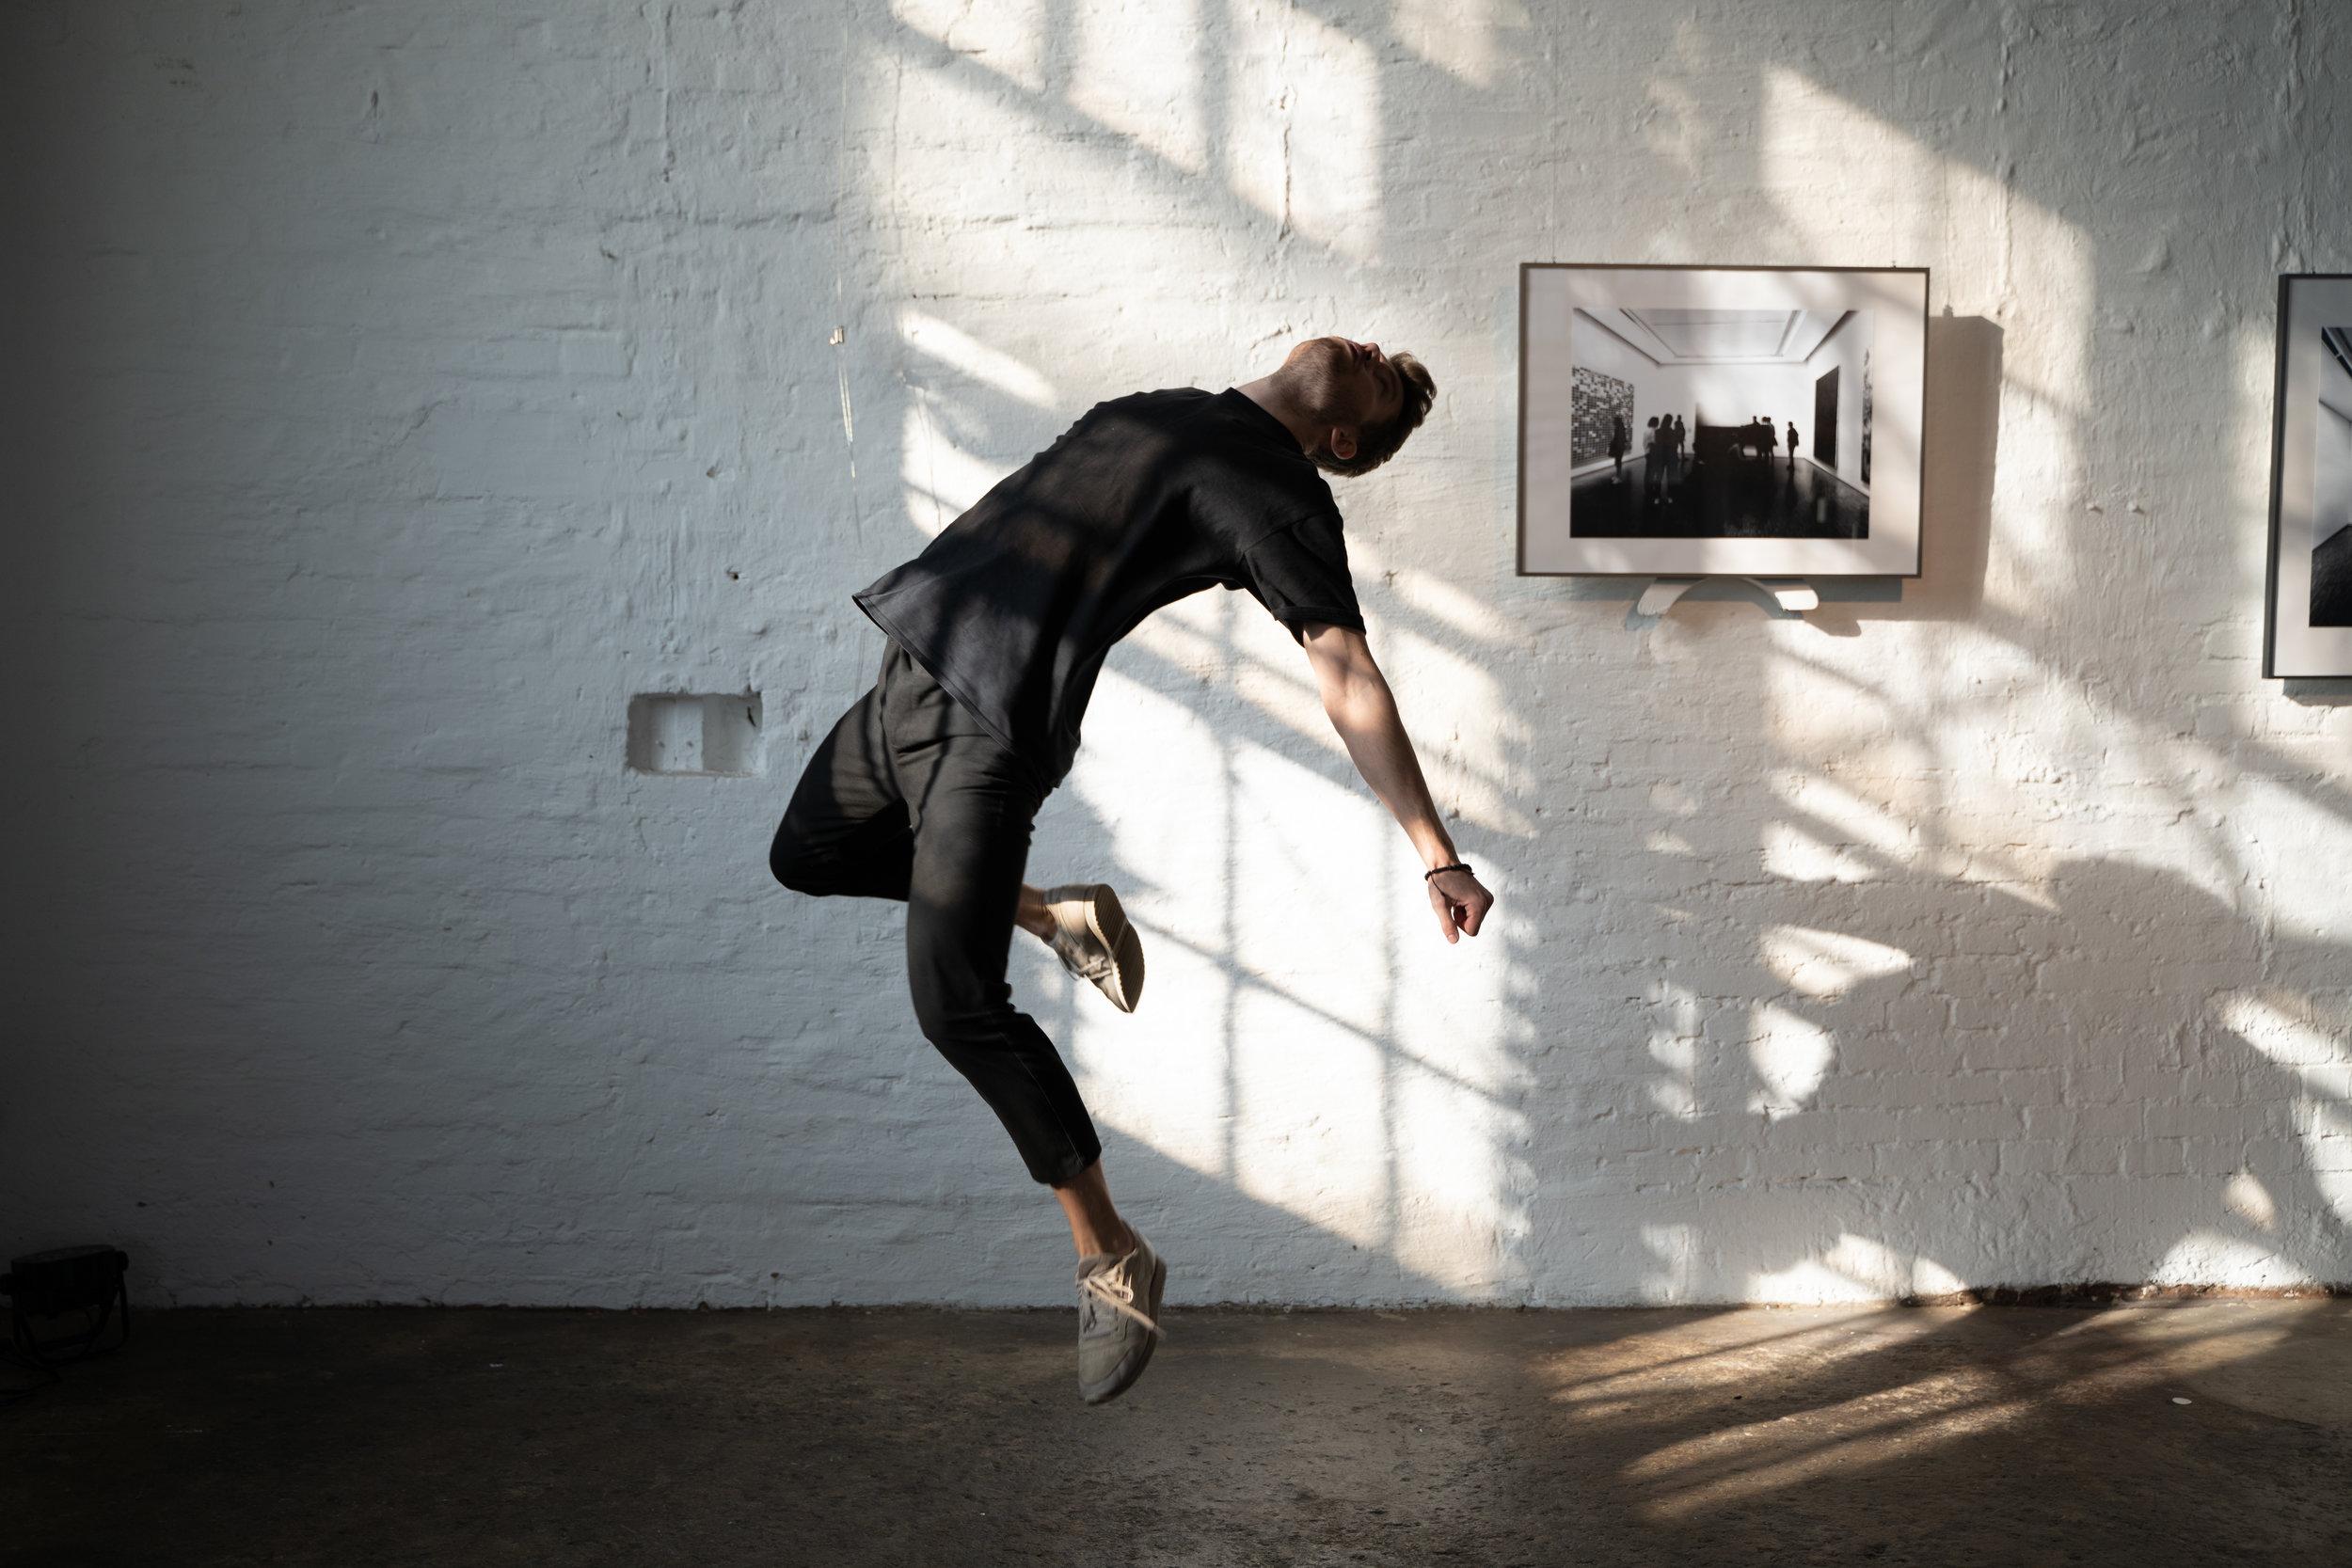 Alex_Heimer_Dance-Pose.JPG